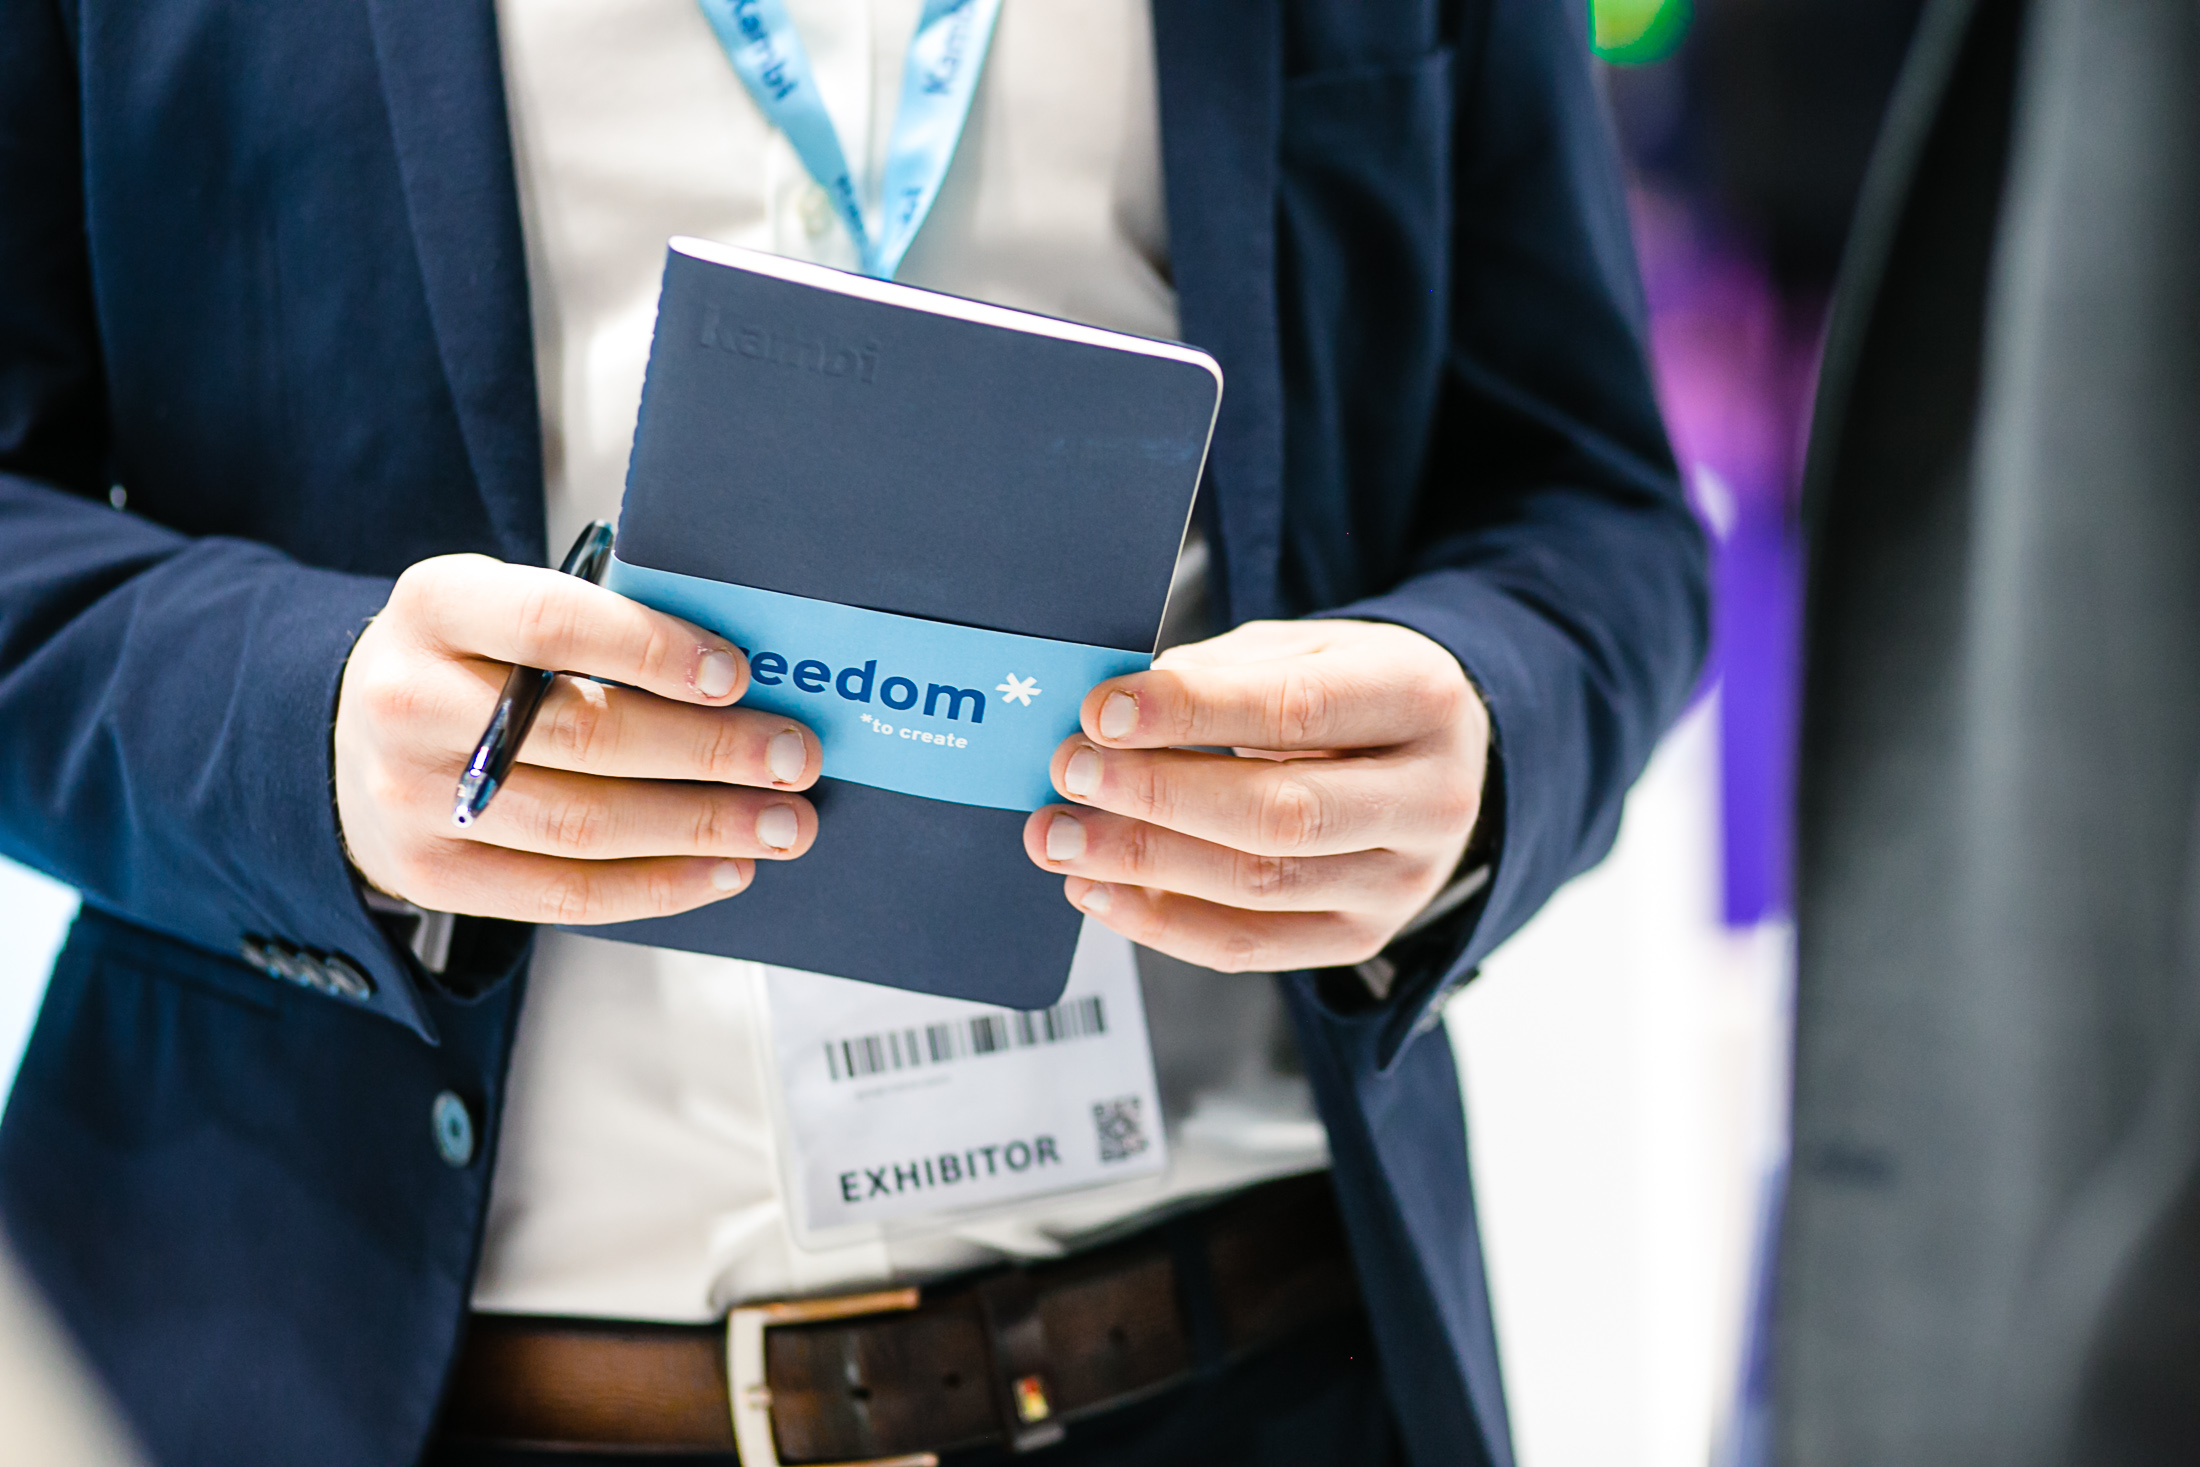 helen_conference_photographer_london-17.jpg